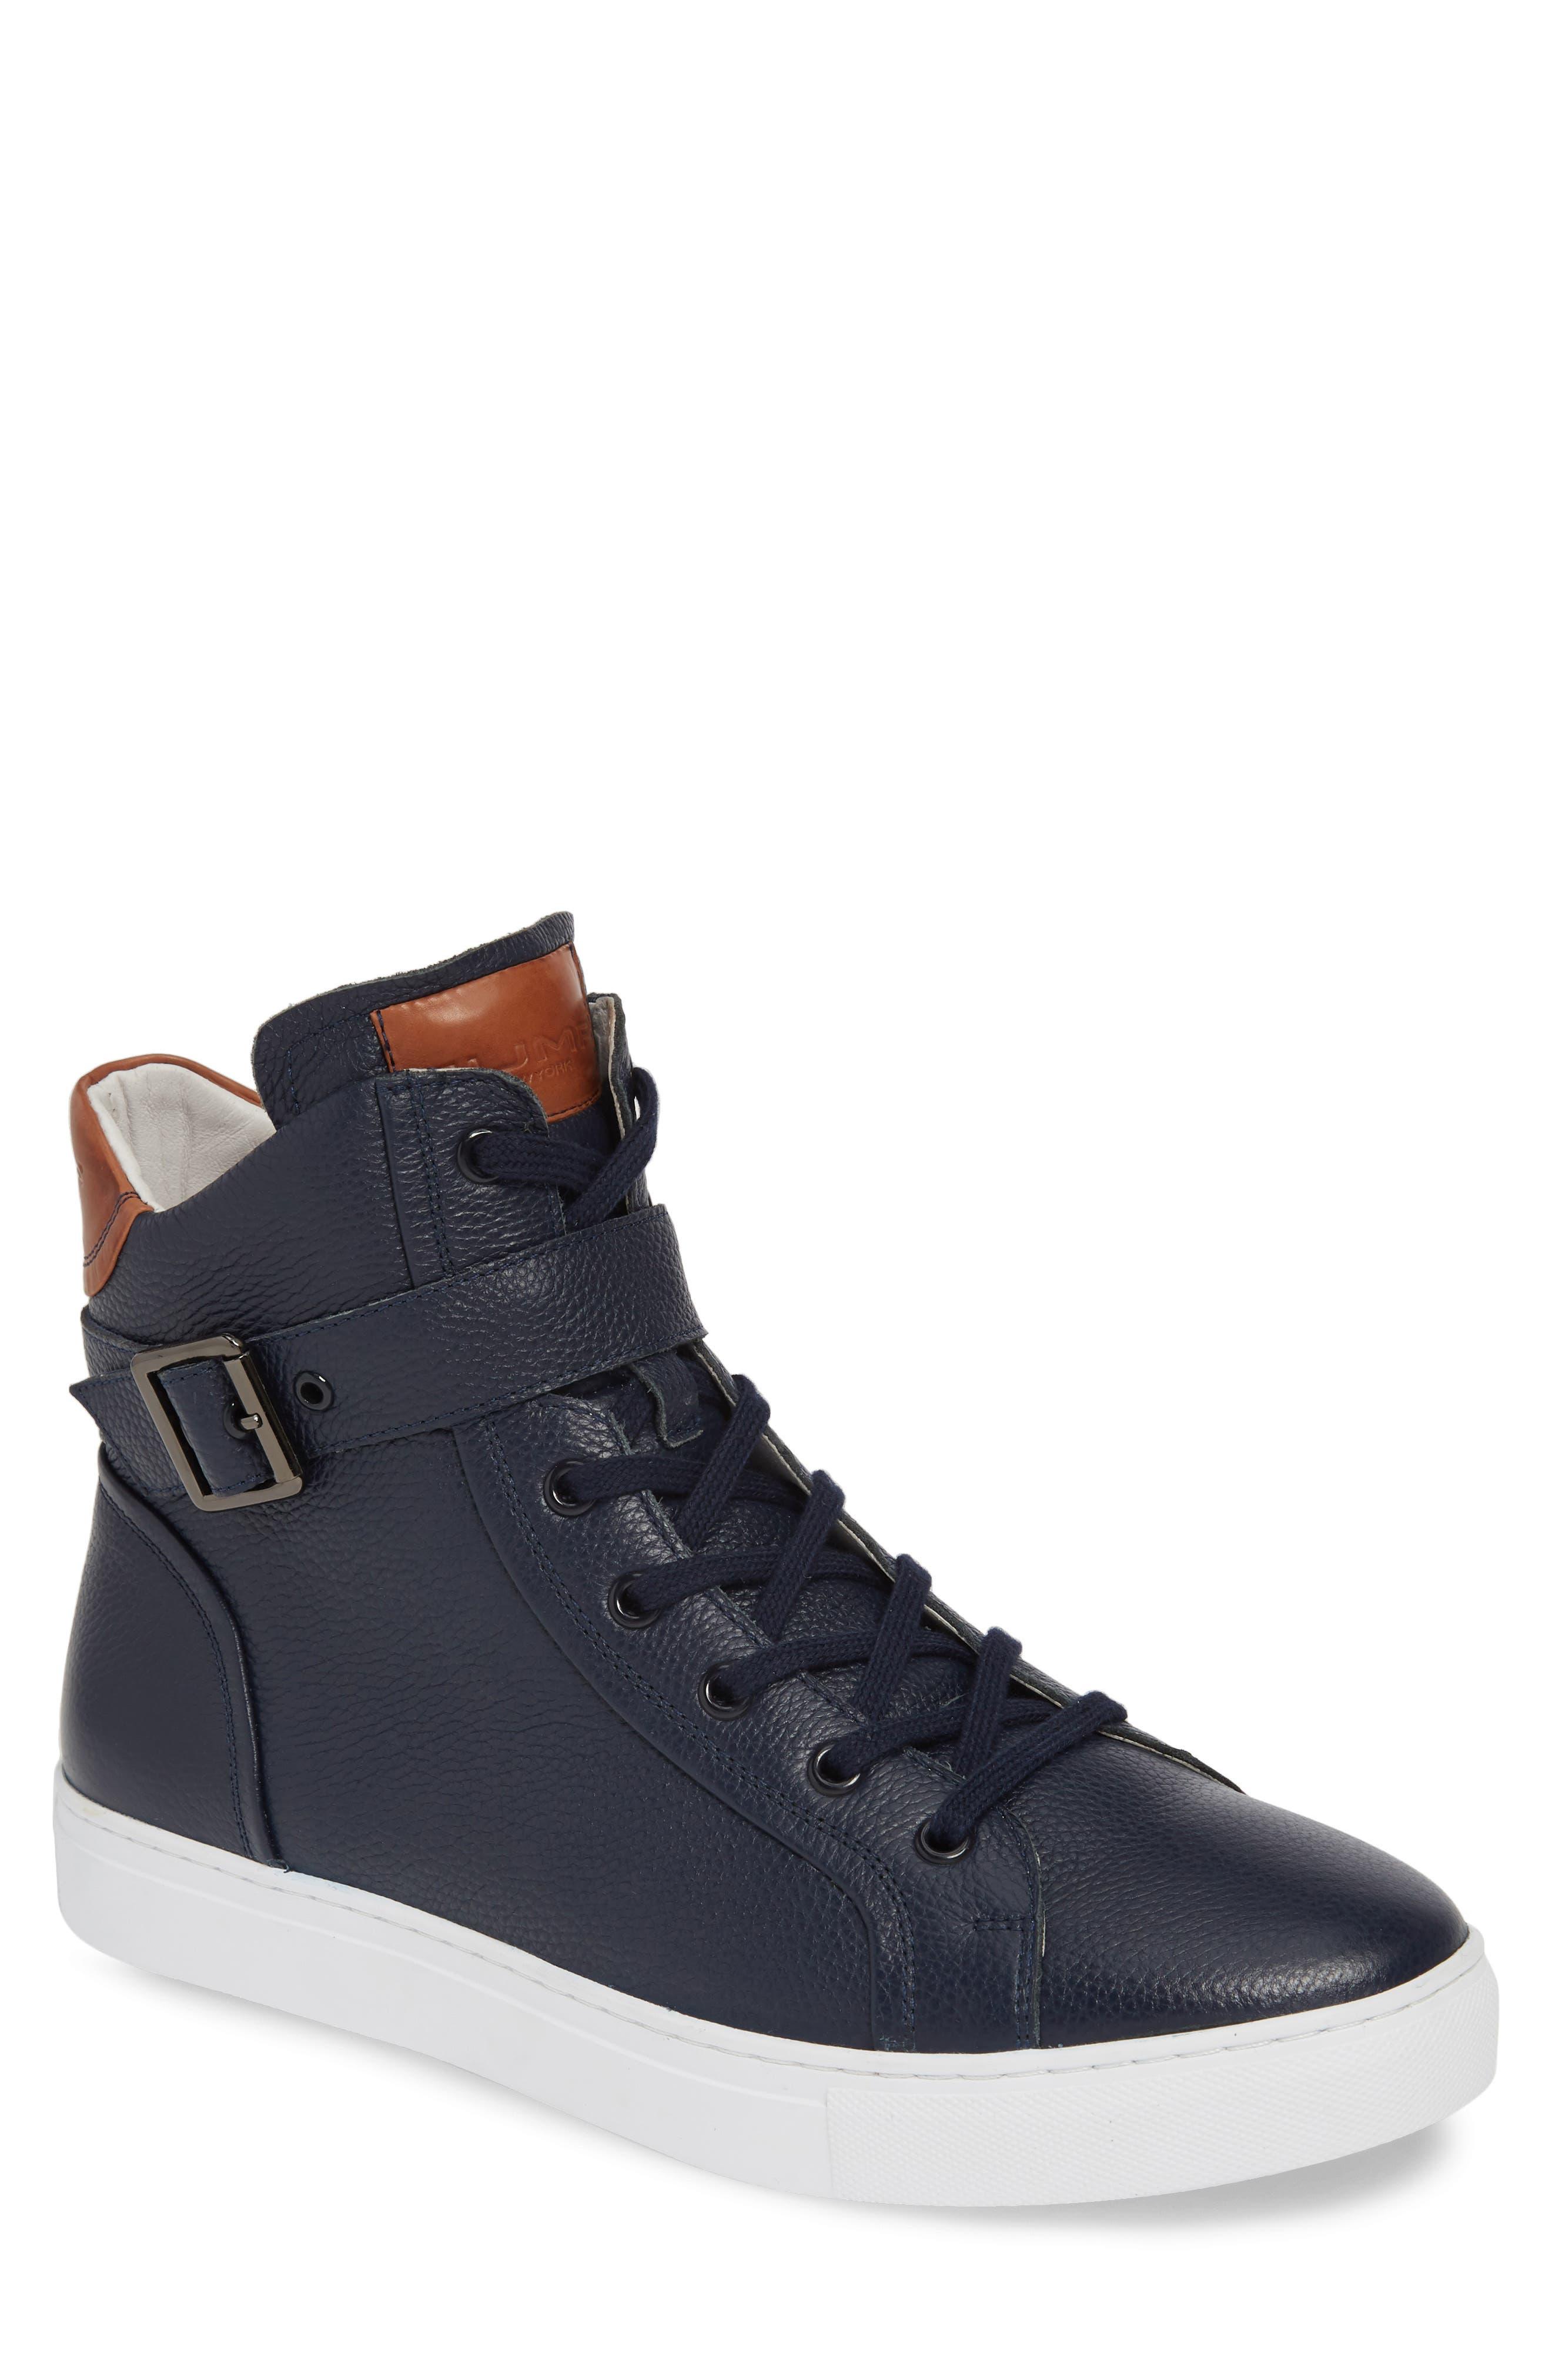 JUMP, Bloke Sneaker, Main thumbnail 1, color, NAVY LEATHER